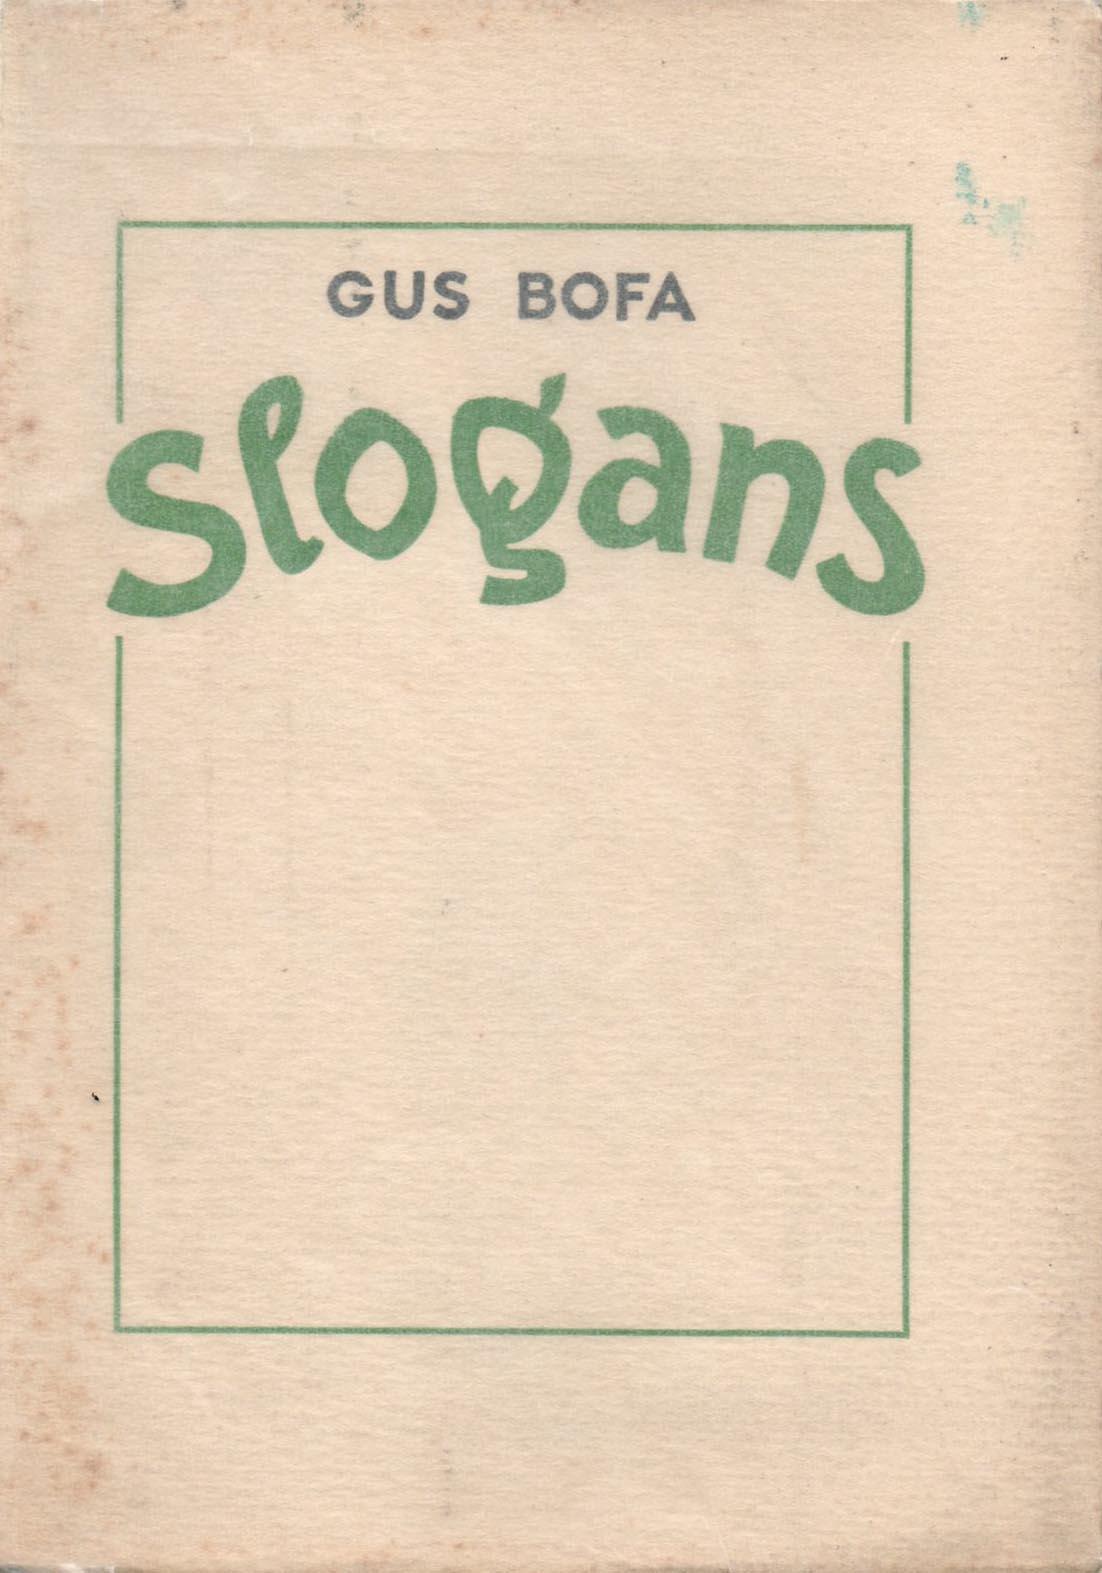 Slogans | Gus Bofa | Slogans